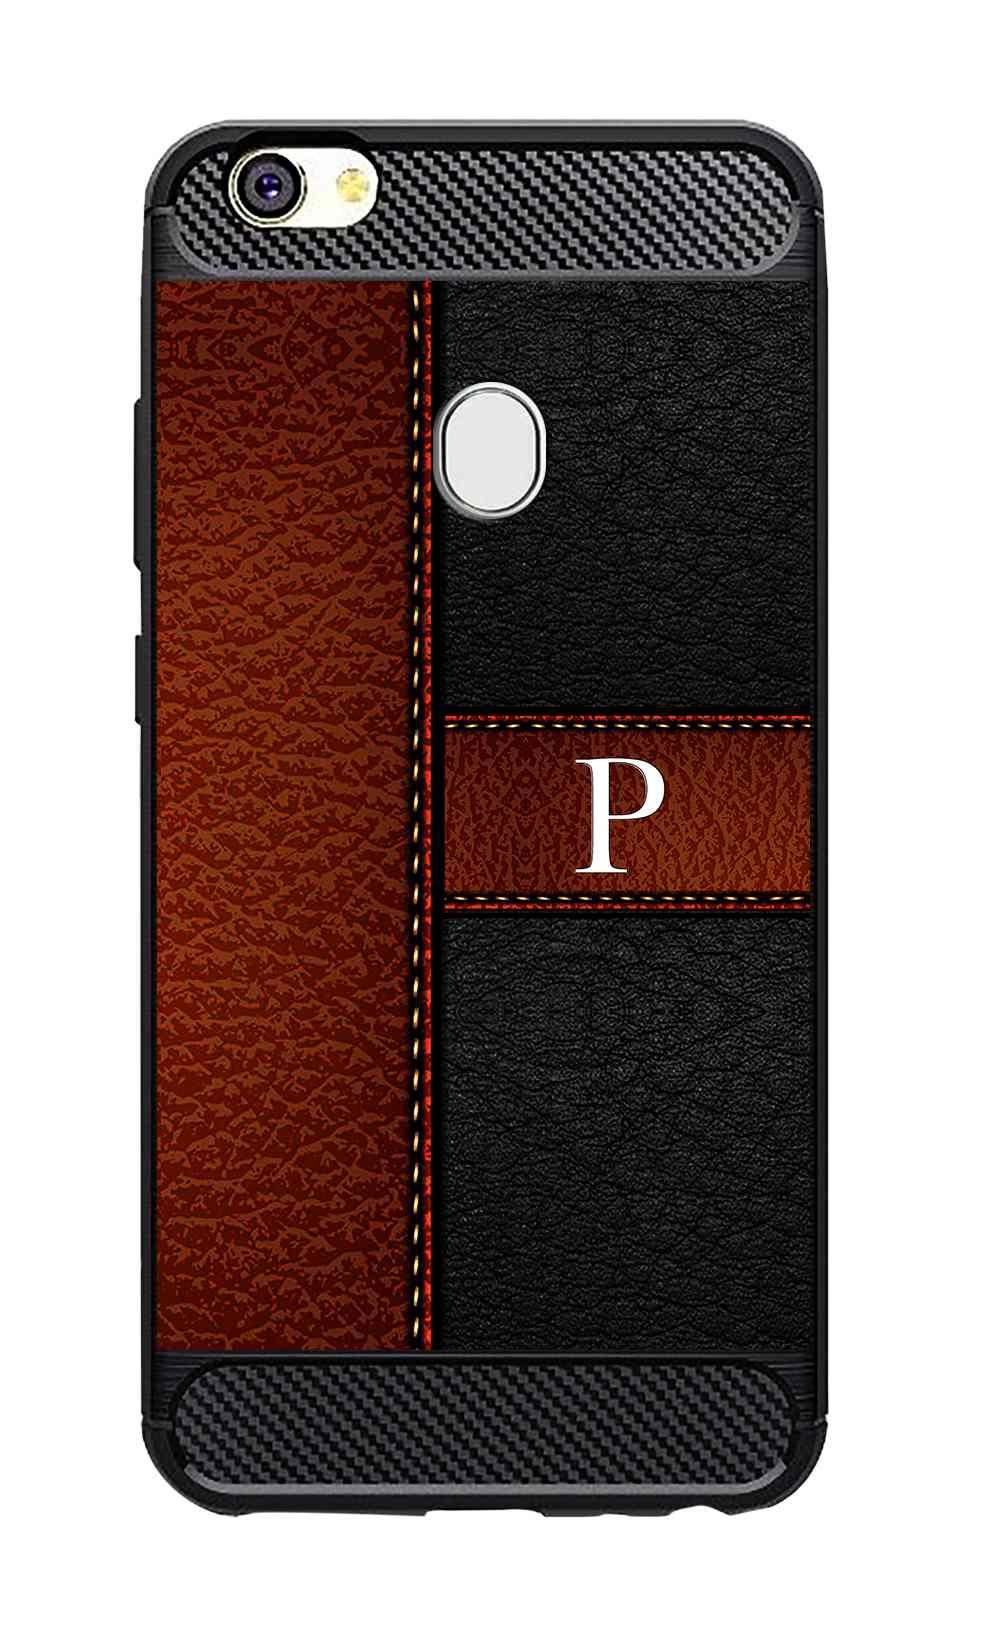 Oppo F7 3D Back Covers By ZAPCASE